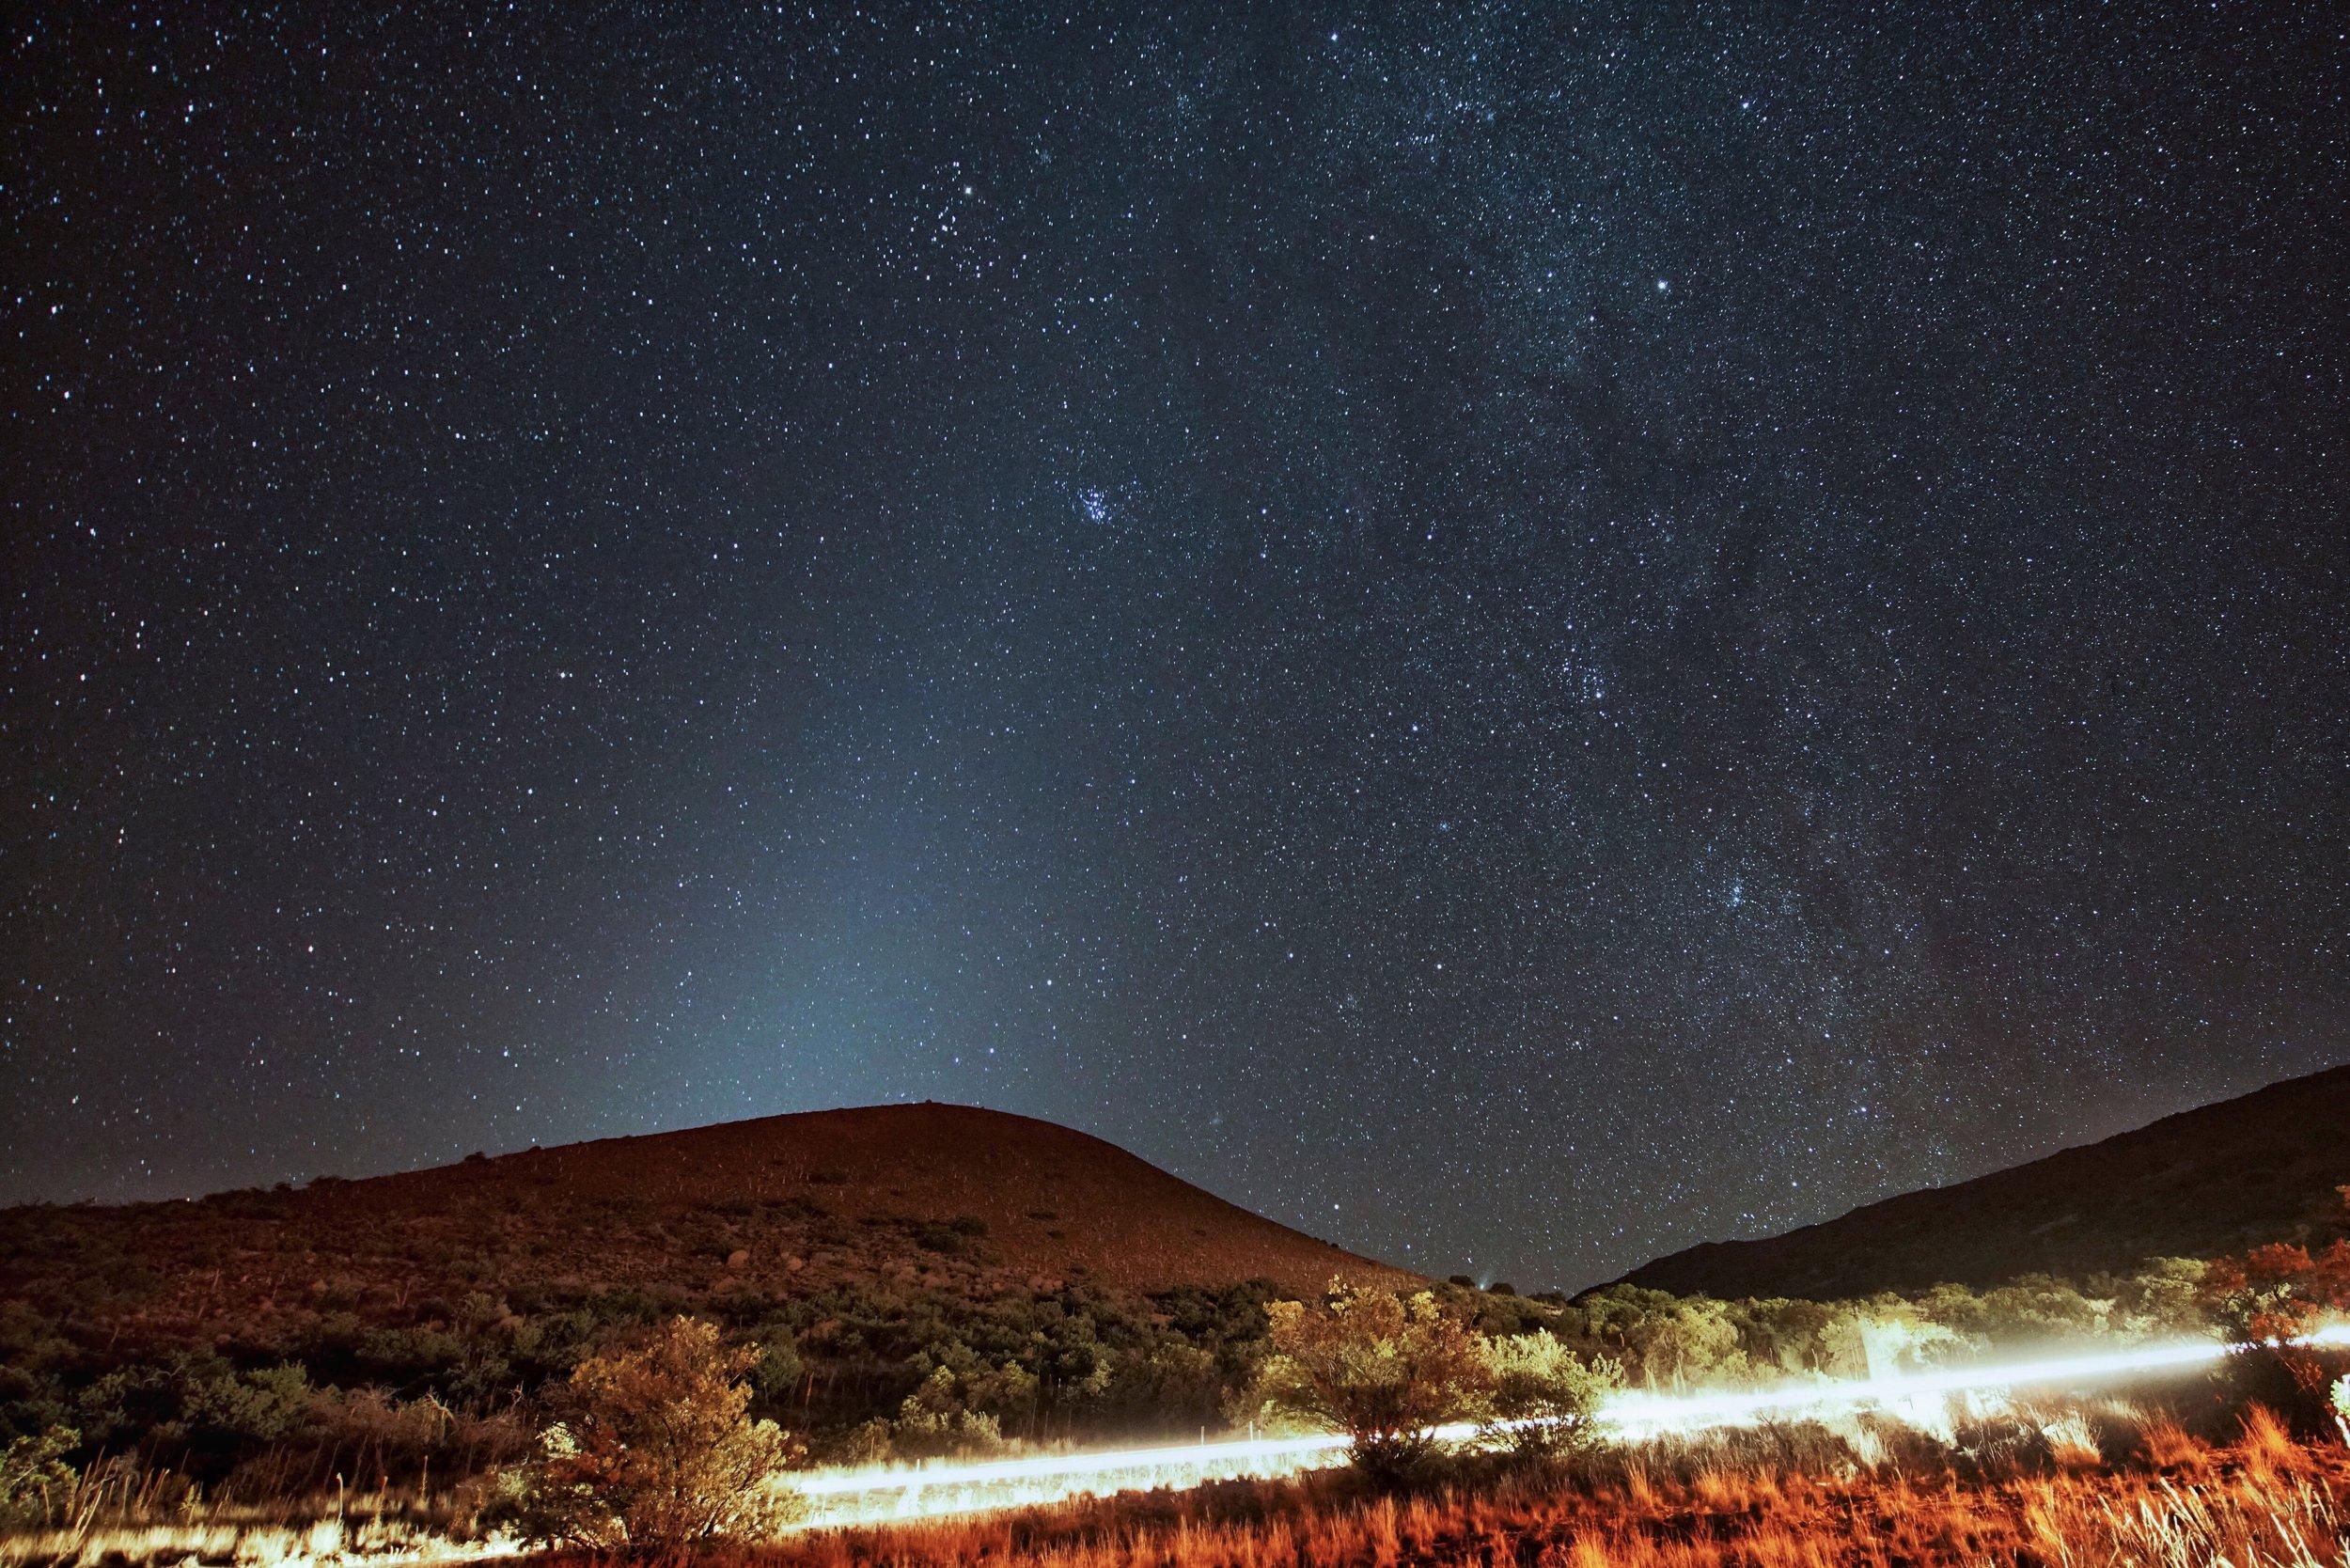 Milky Way and Zodiacal Light, from atop Mauna Kea, Hawaii